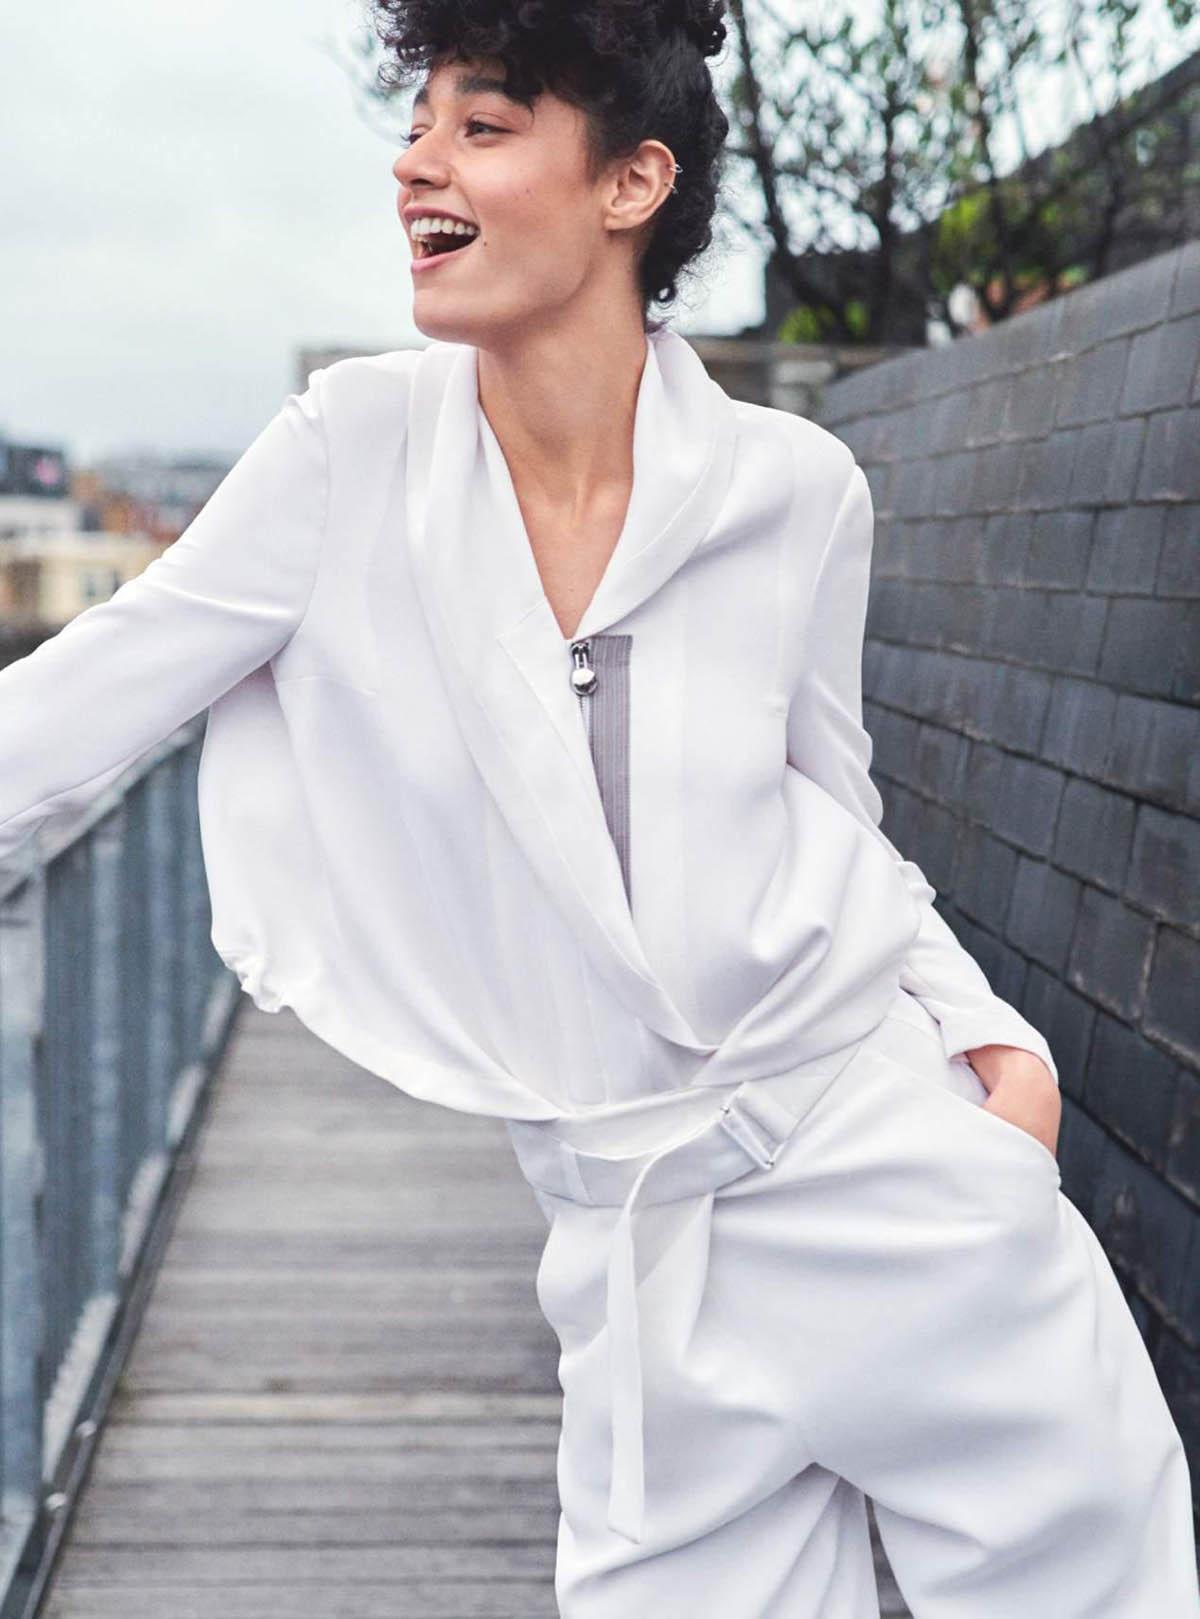 Damaris Goddrie by Jem Mitchell for Harper's Bazaar UK April 2021